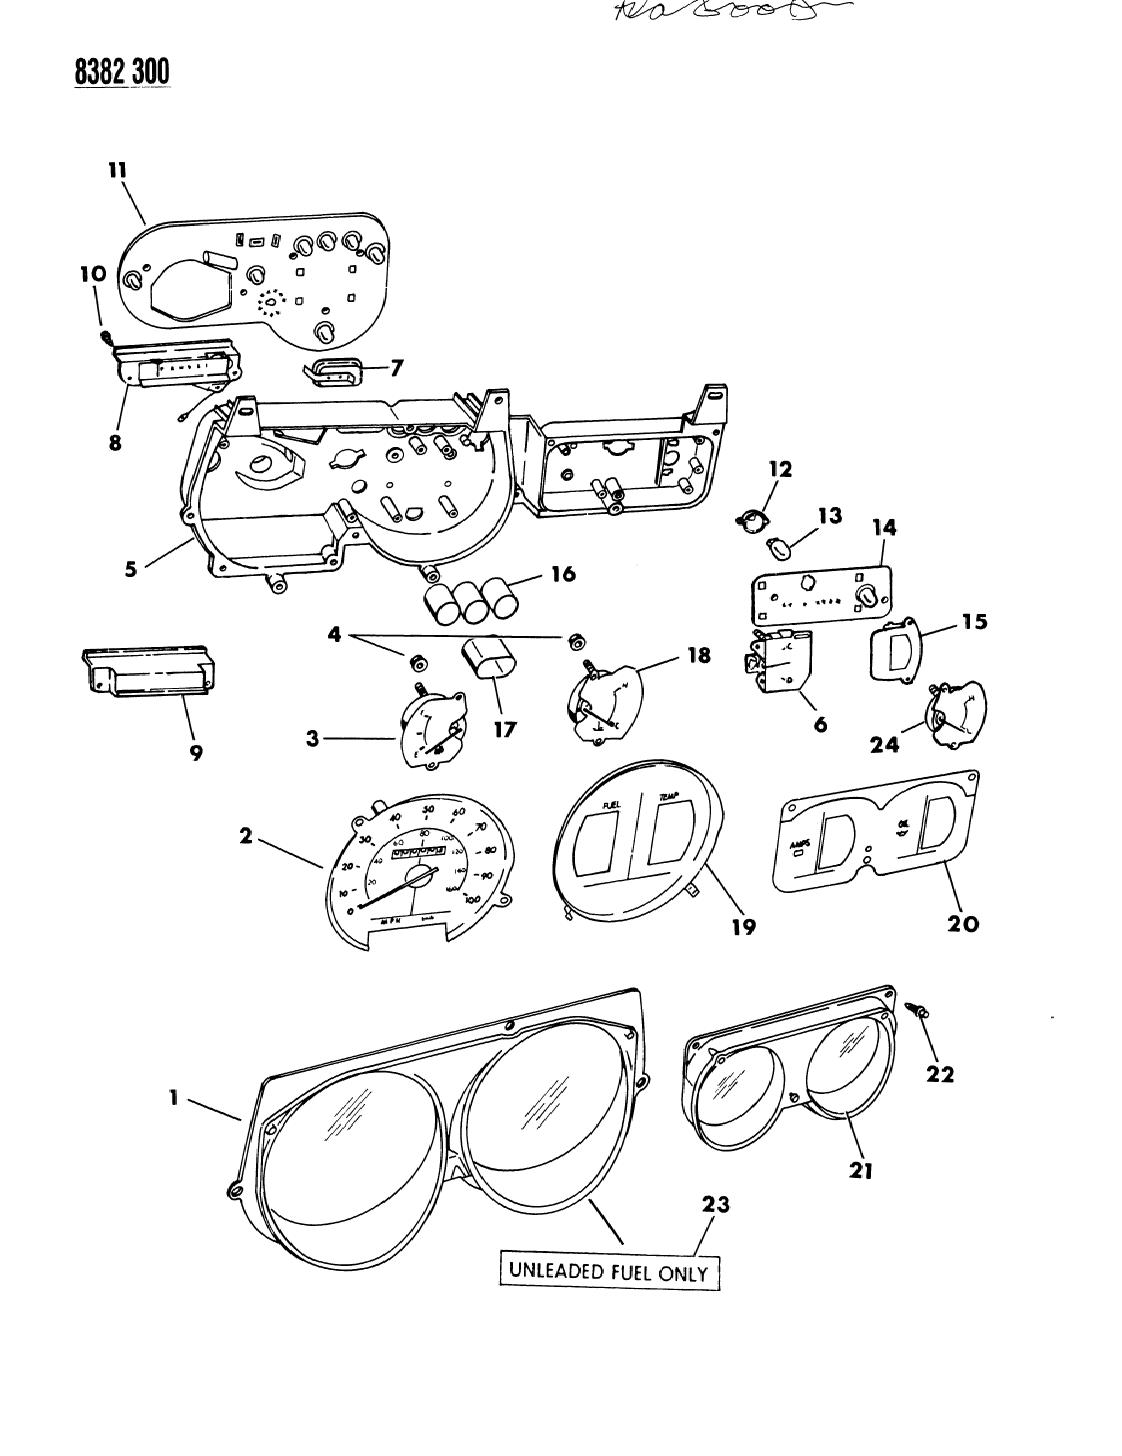 1989 Dodge Ram Van Instrument Panel Cluster Mopar Parts Giant Wiring Diagram